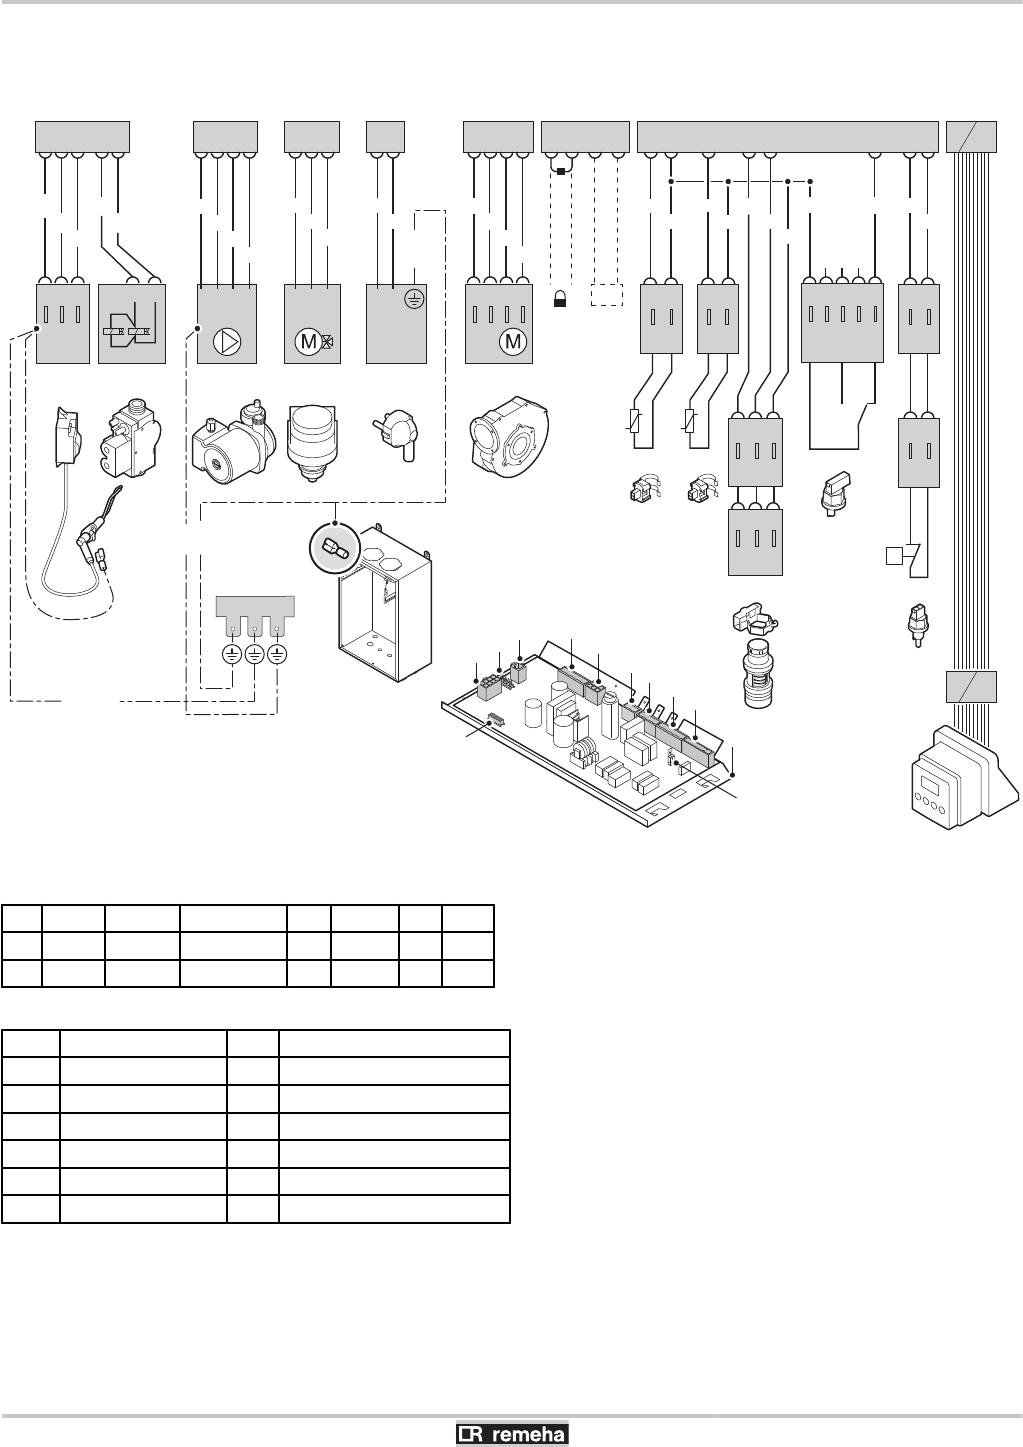 fd16f6202f1 Handleiding Remeha Avanta 28c CW4 (pagina 39 van 72) (Nederlands)